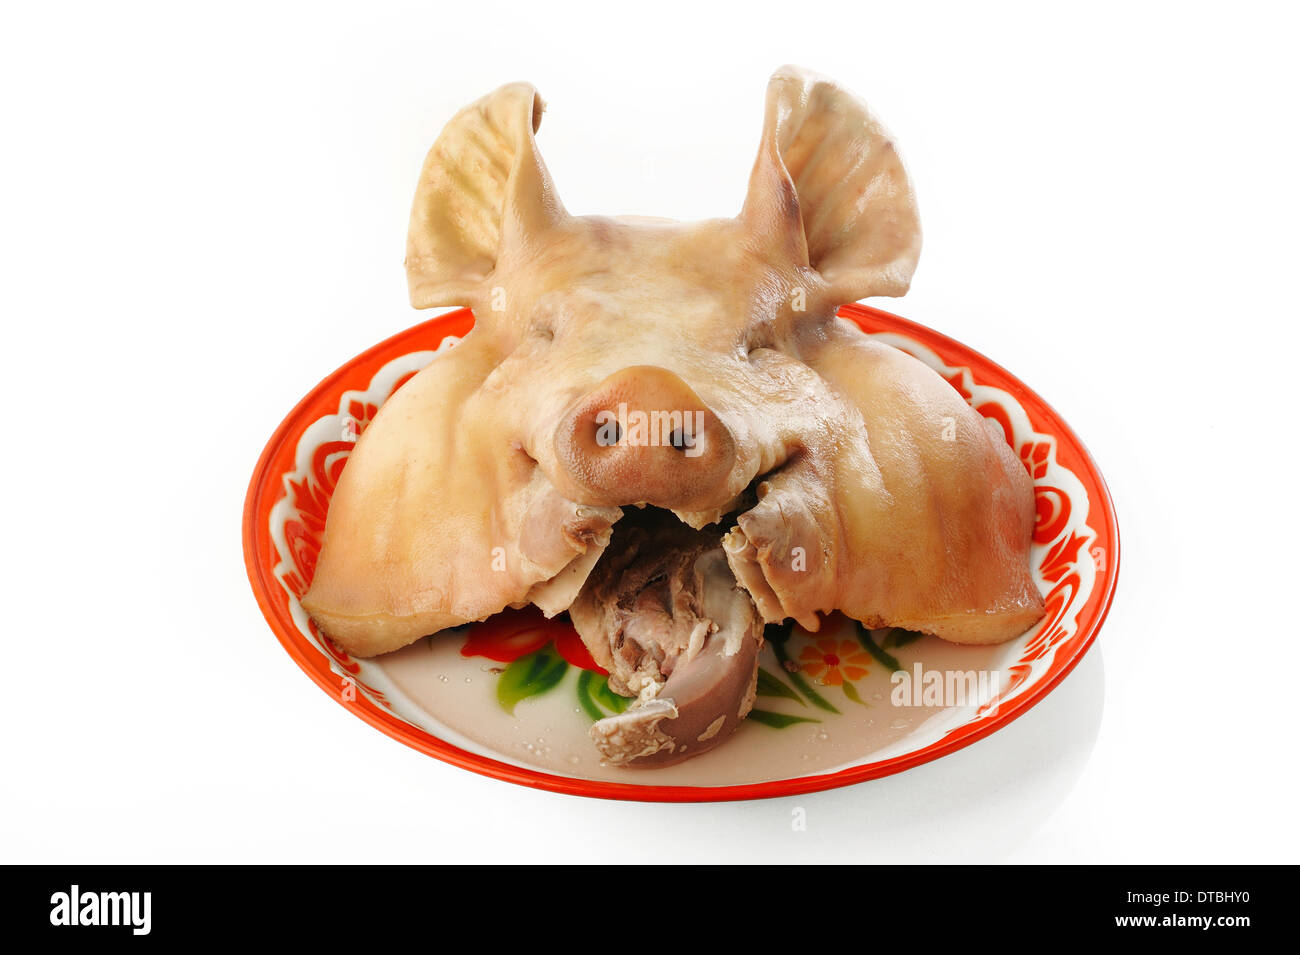 Gekochter Schweinekopf auf Tablett Stockbild